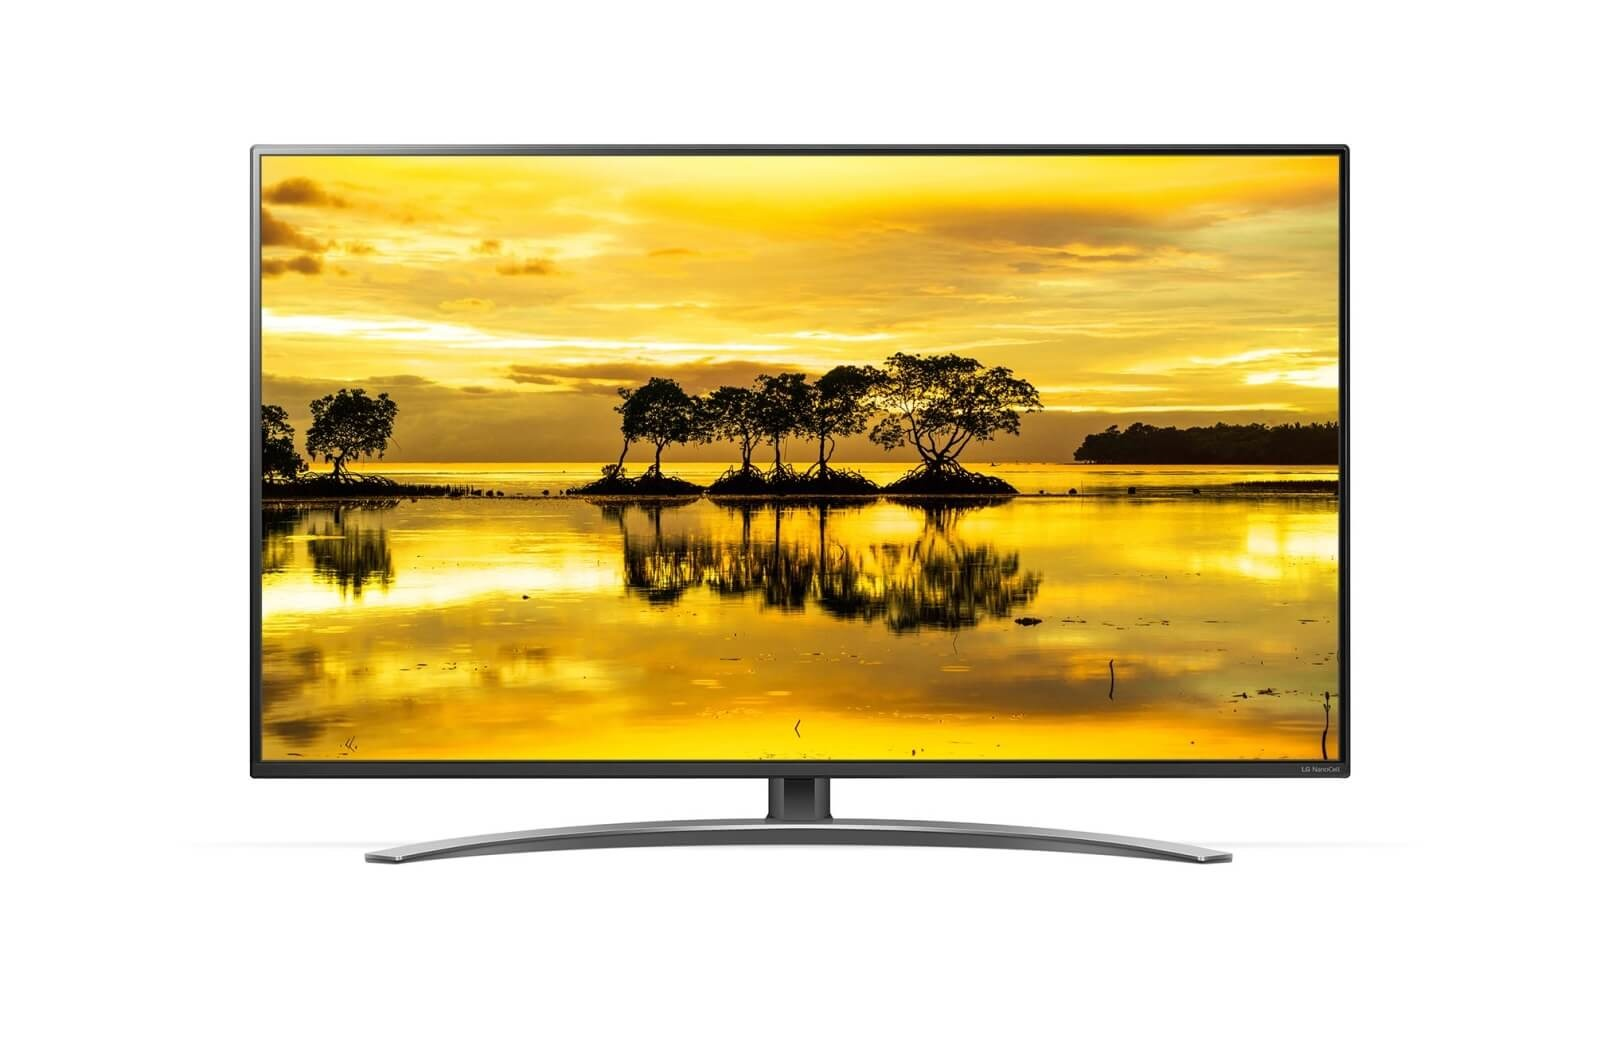 LG UHD TV 49SM9000